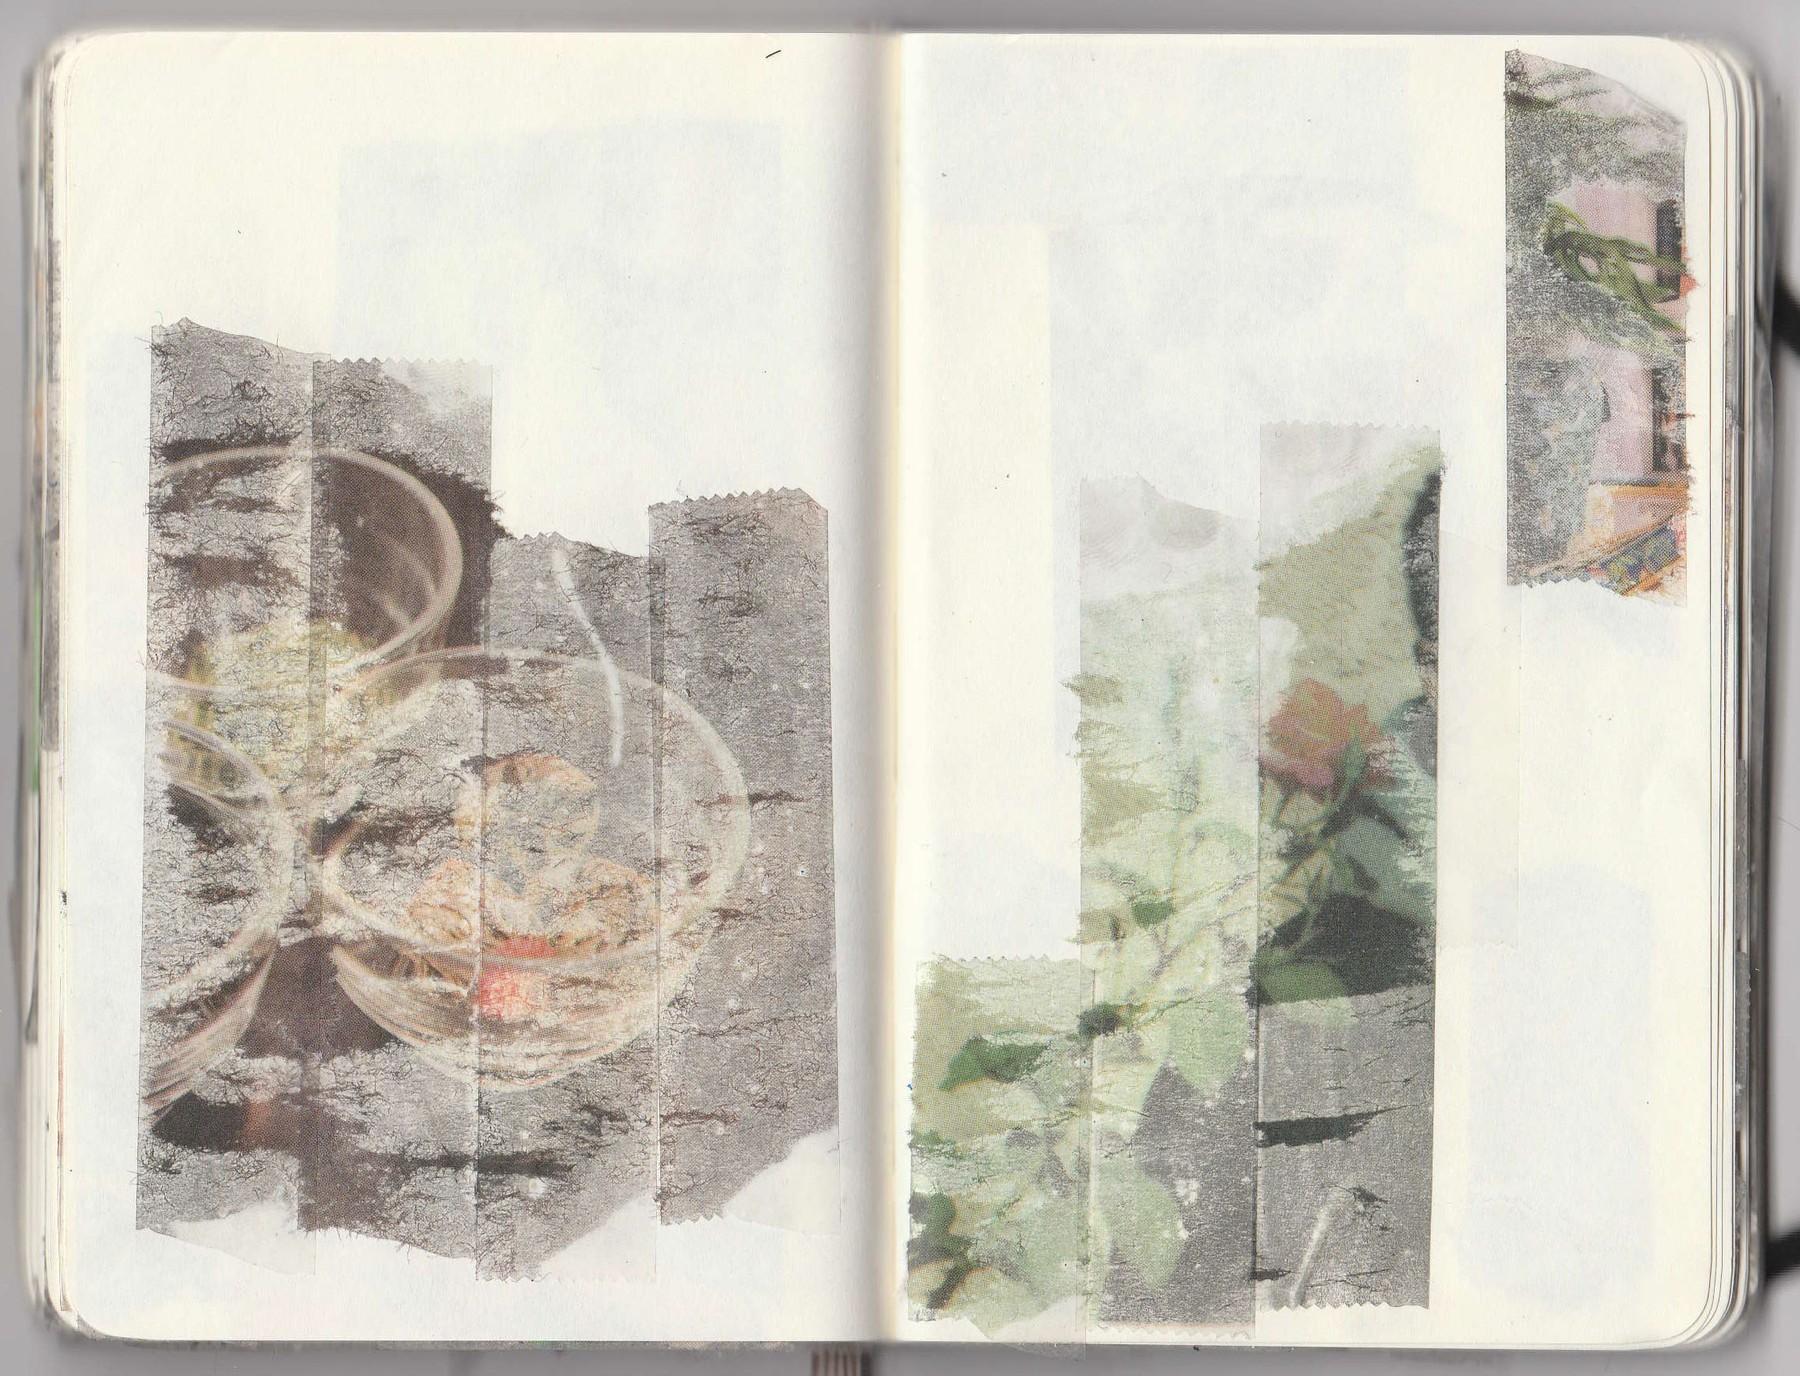 Christopher Schreck, Tape Transfers, sketchbook, 2019